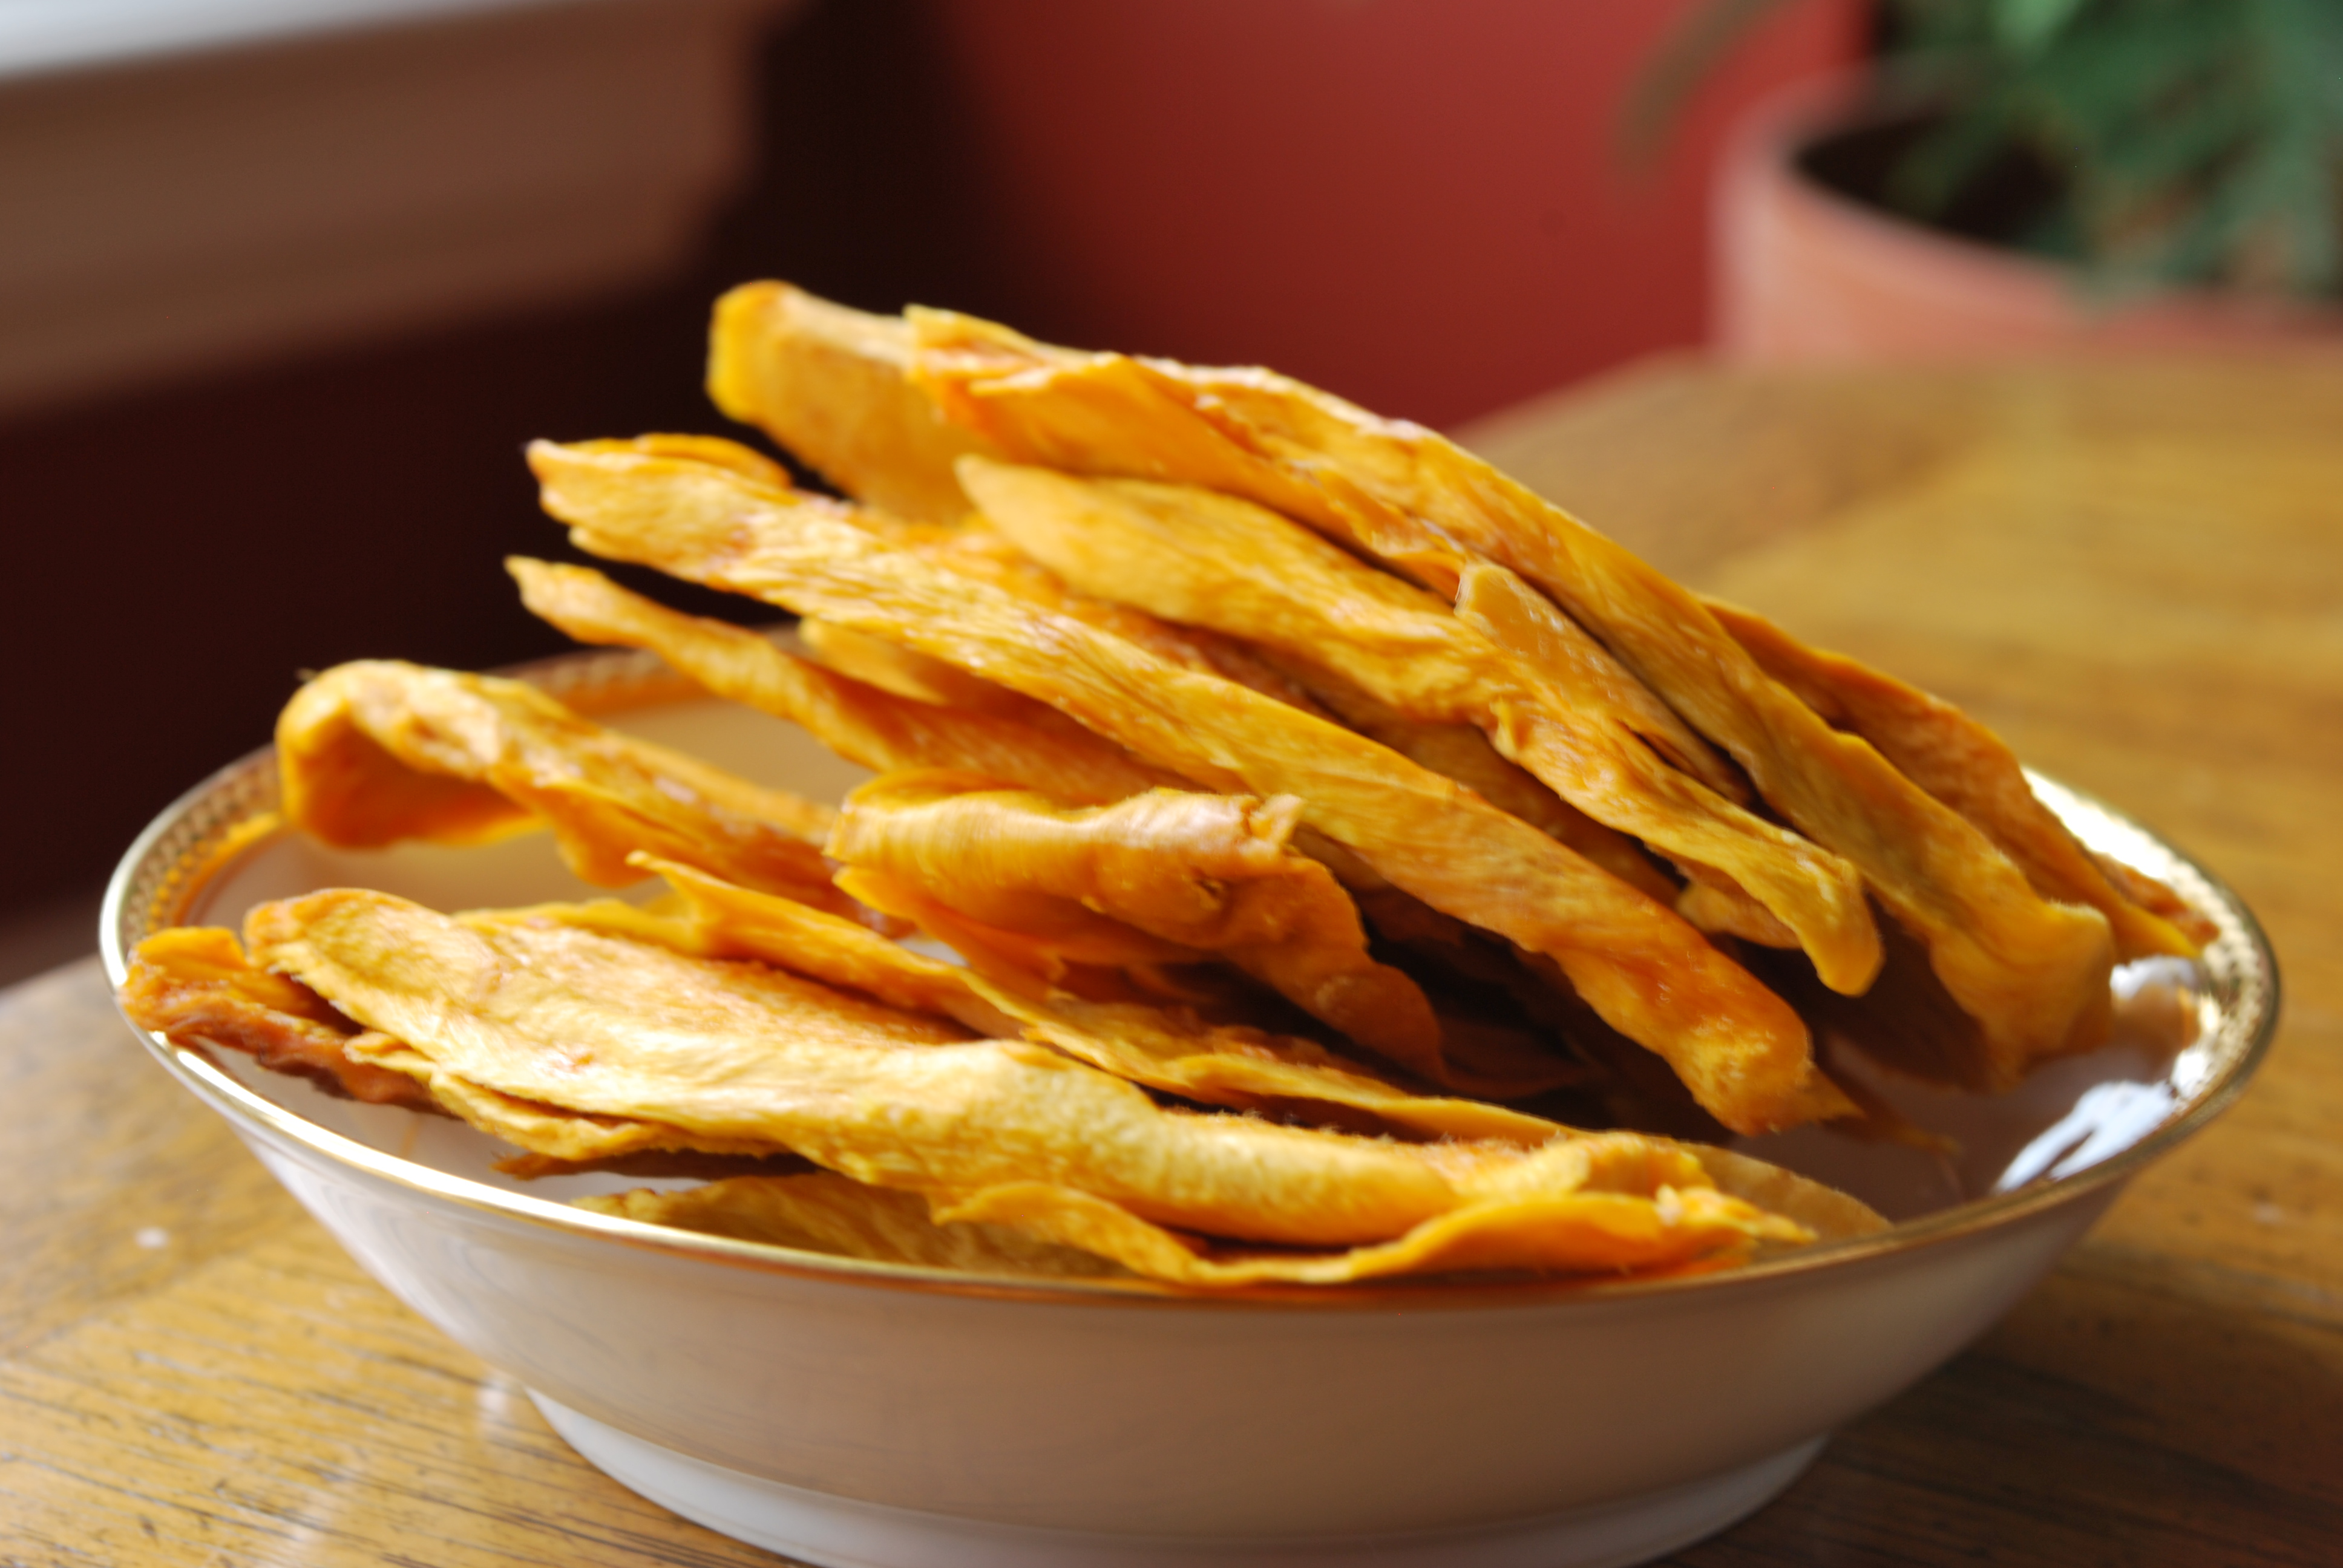 Mango: description, use. Nutritional value and calorie content of mango 85